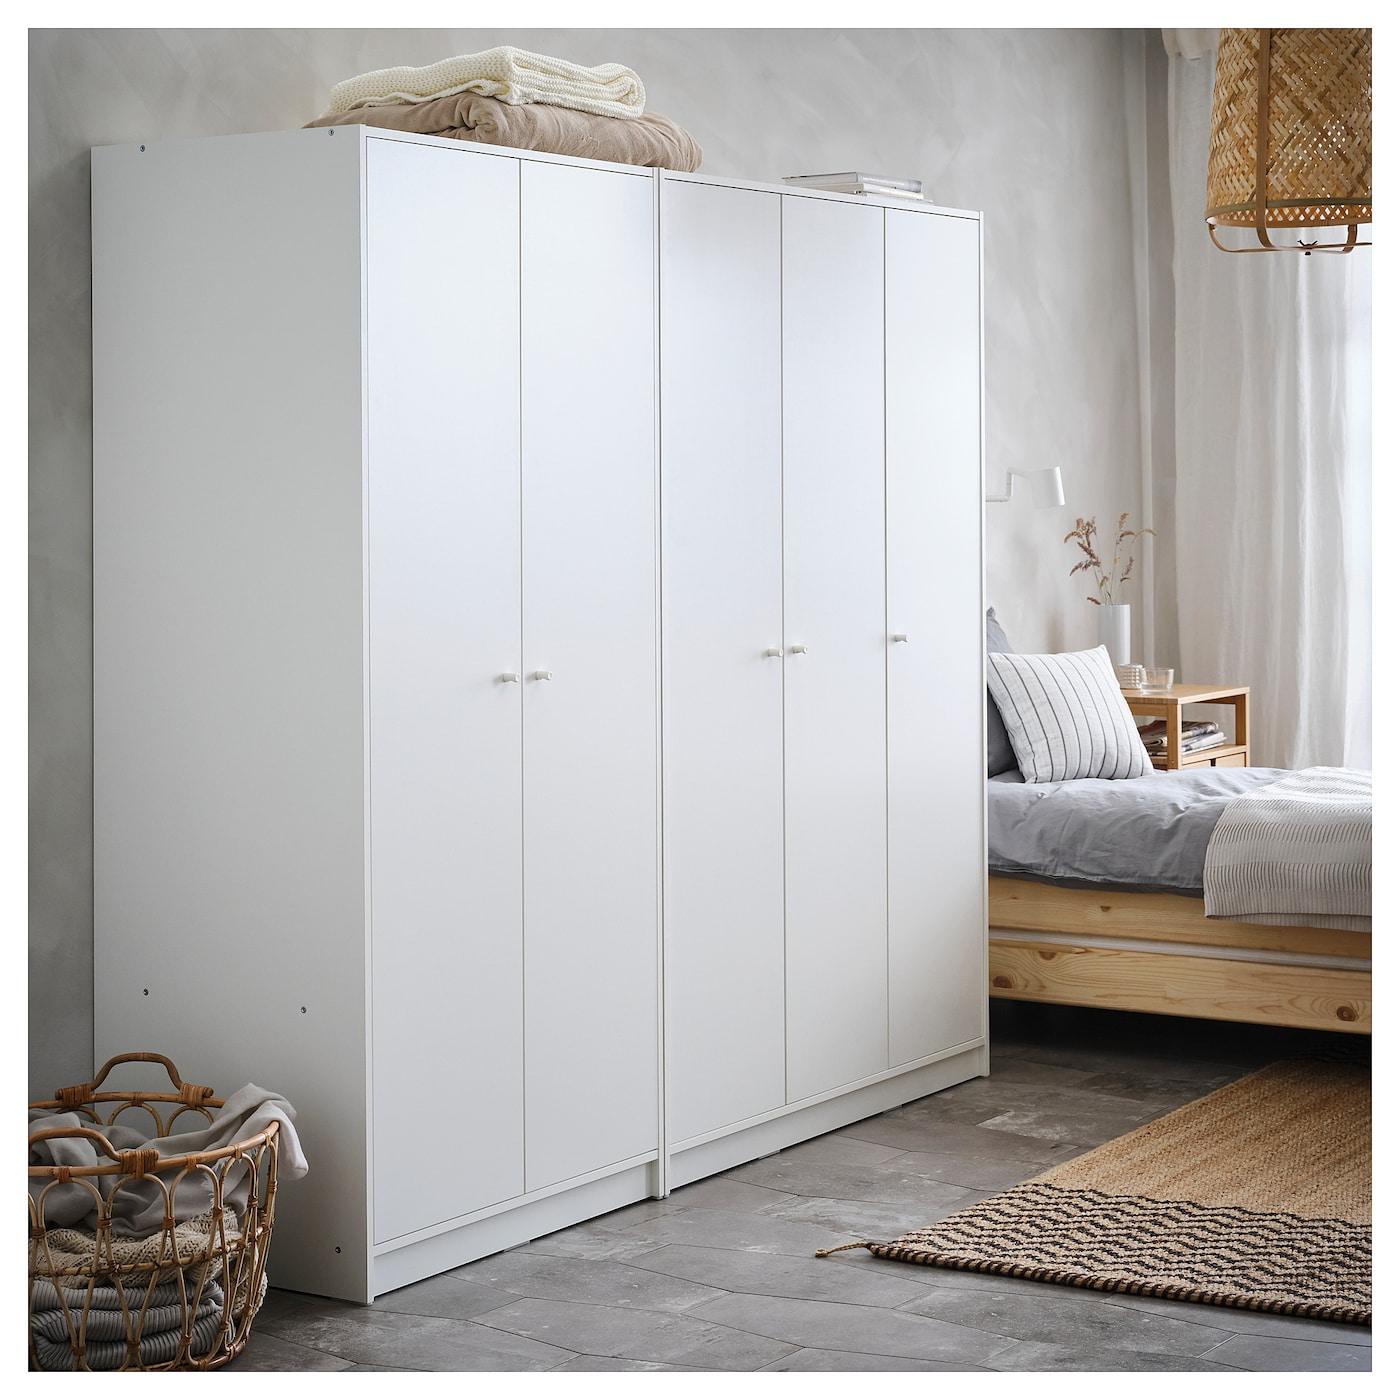 Armadio Ikea 3 Ante.Kleppstad Wardrobe With 3 Doors White Ikea Switzerland